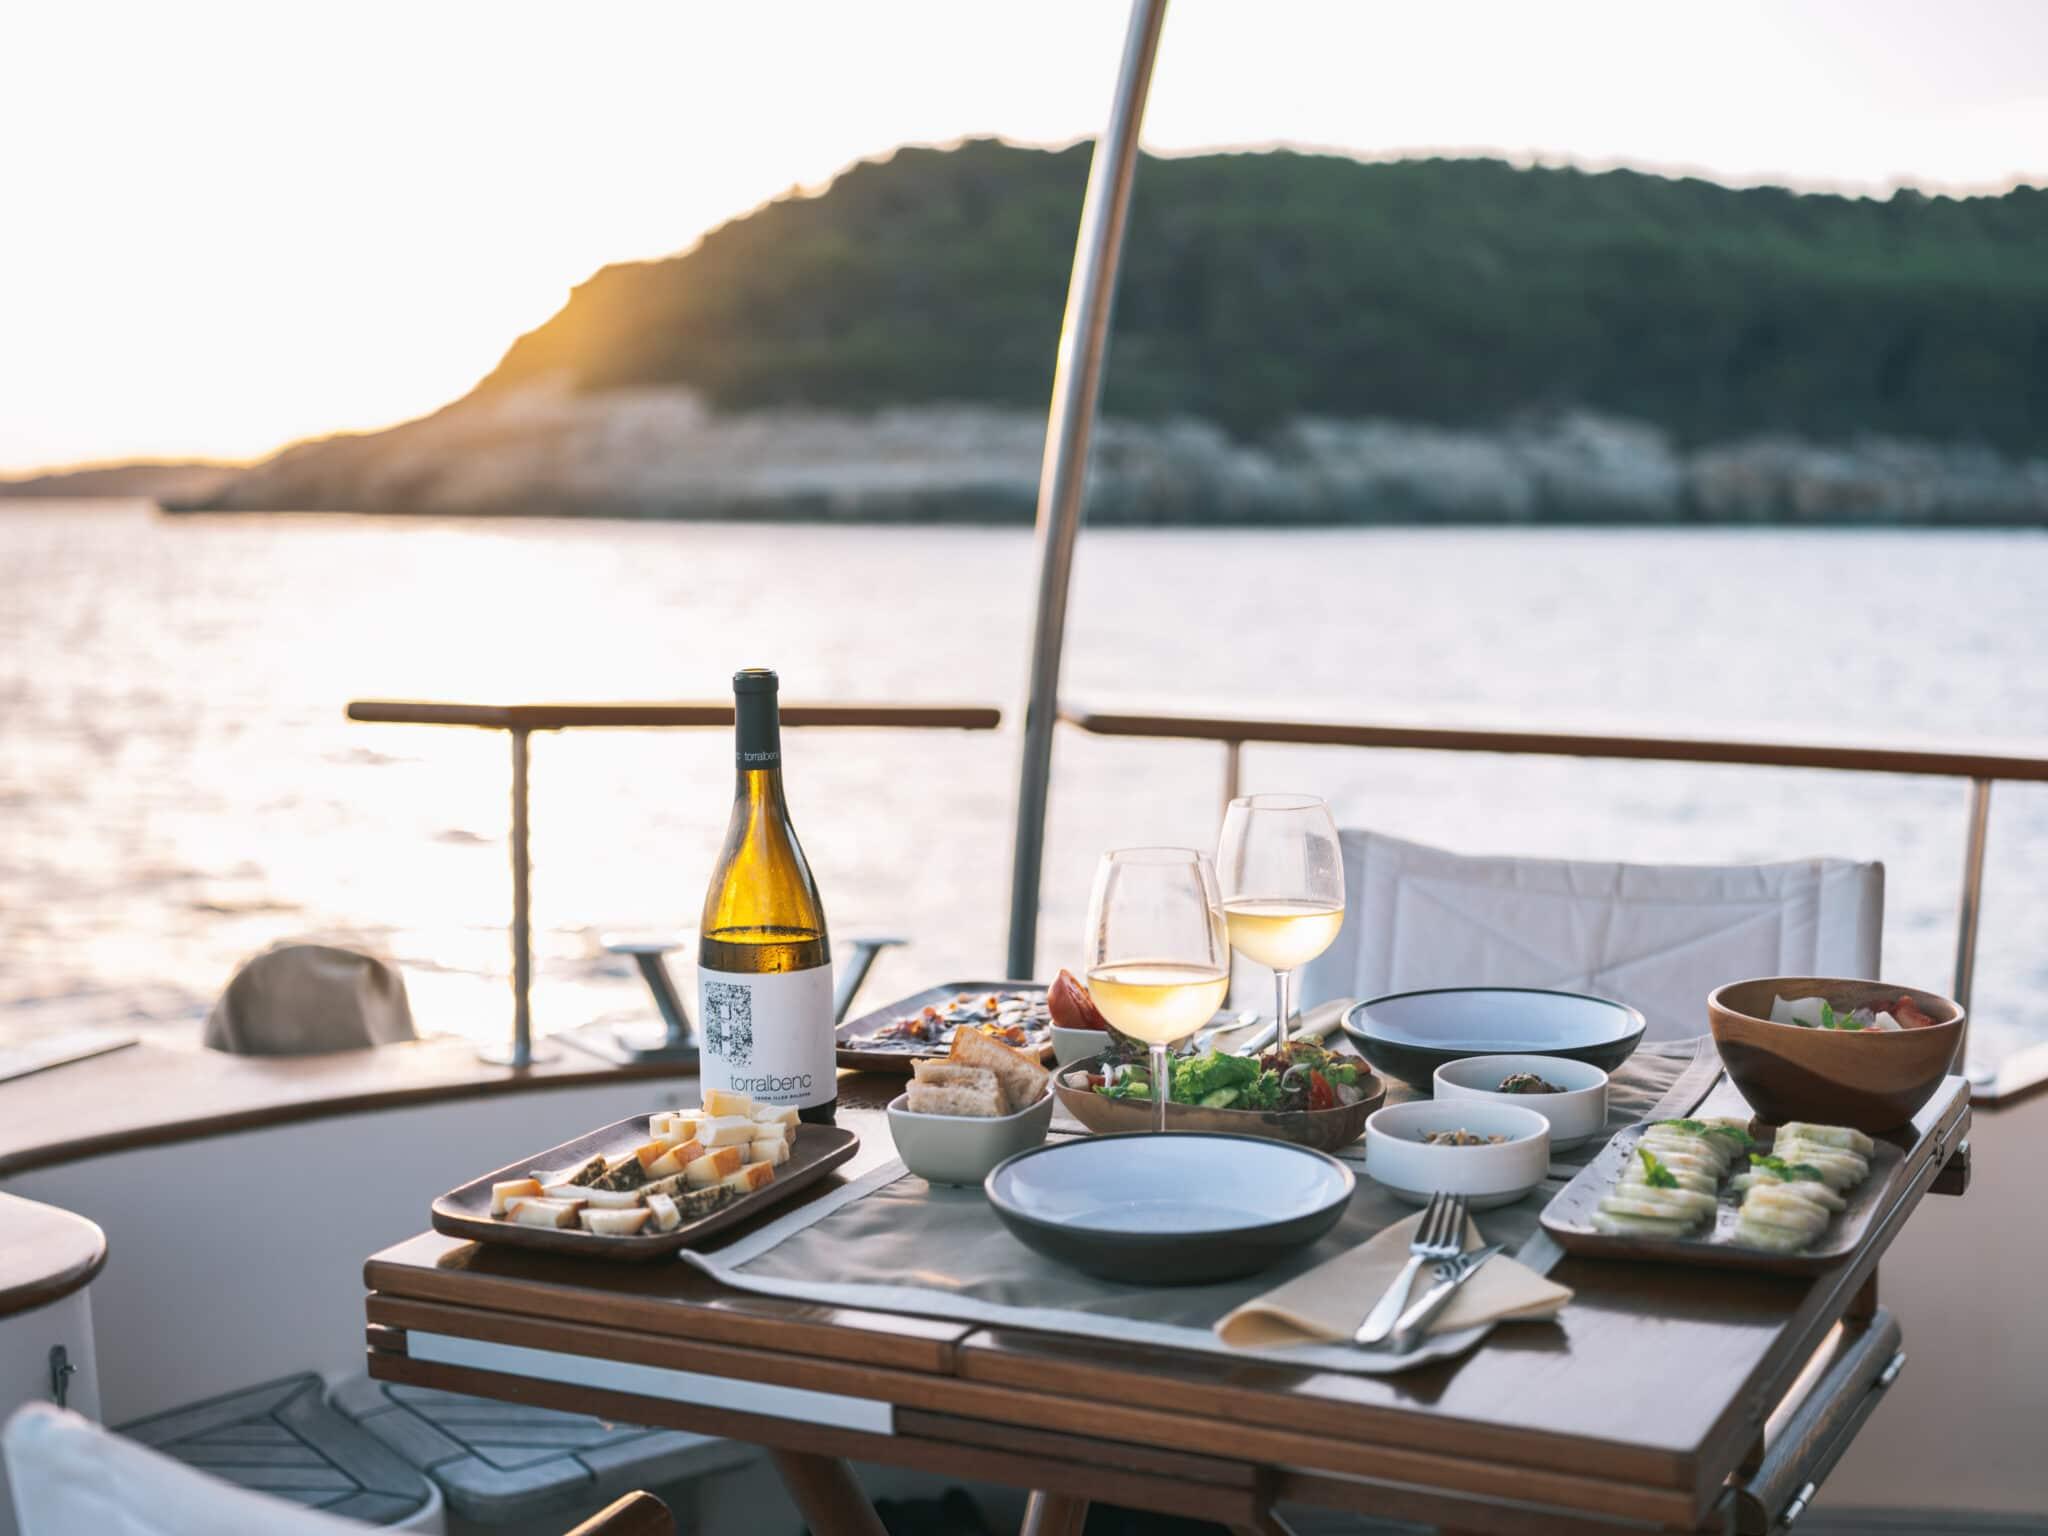 Carrousel 5 torralbenc- dinner-boat-talati-menorca-sunset-mediterranean-sea-DSCF8662